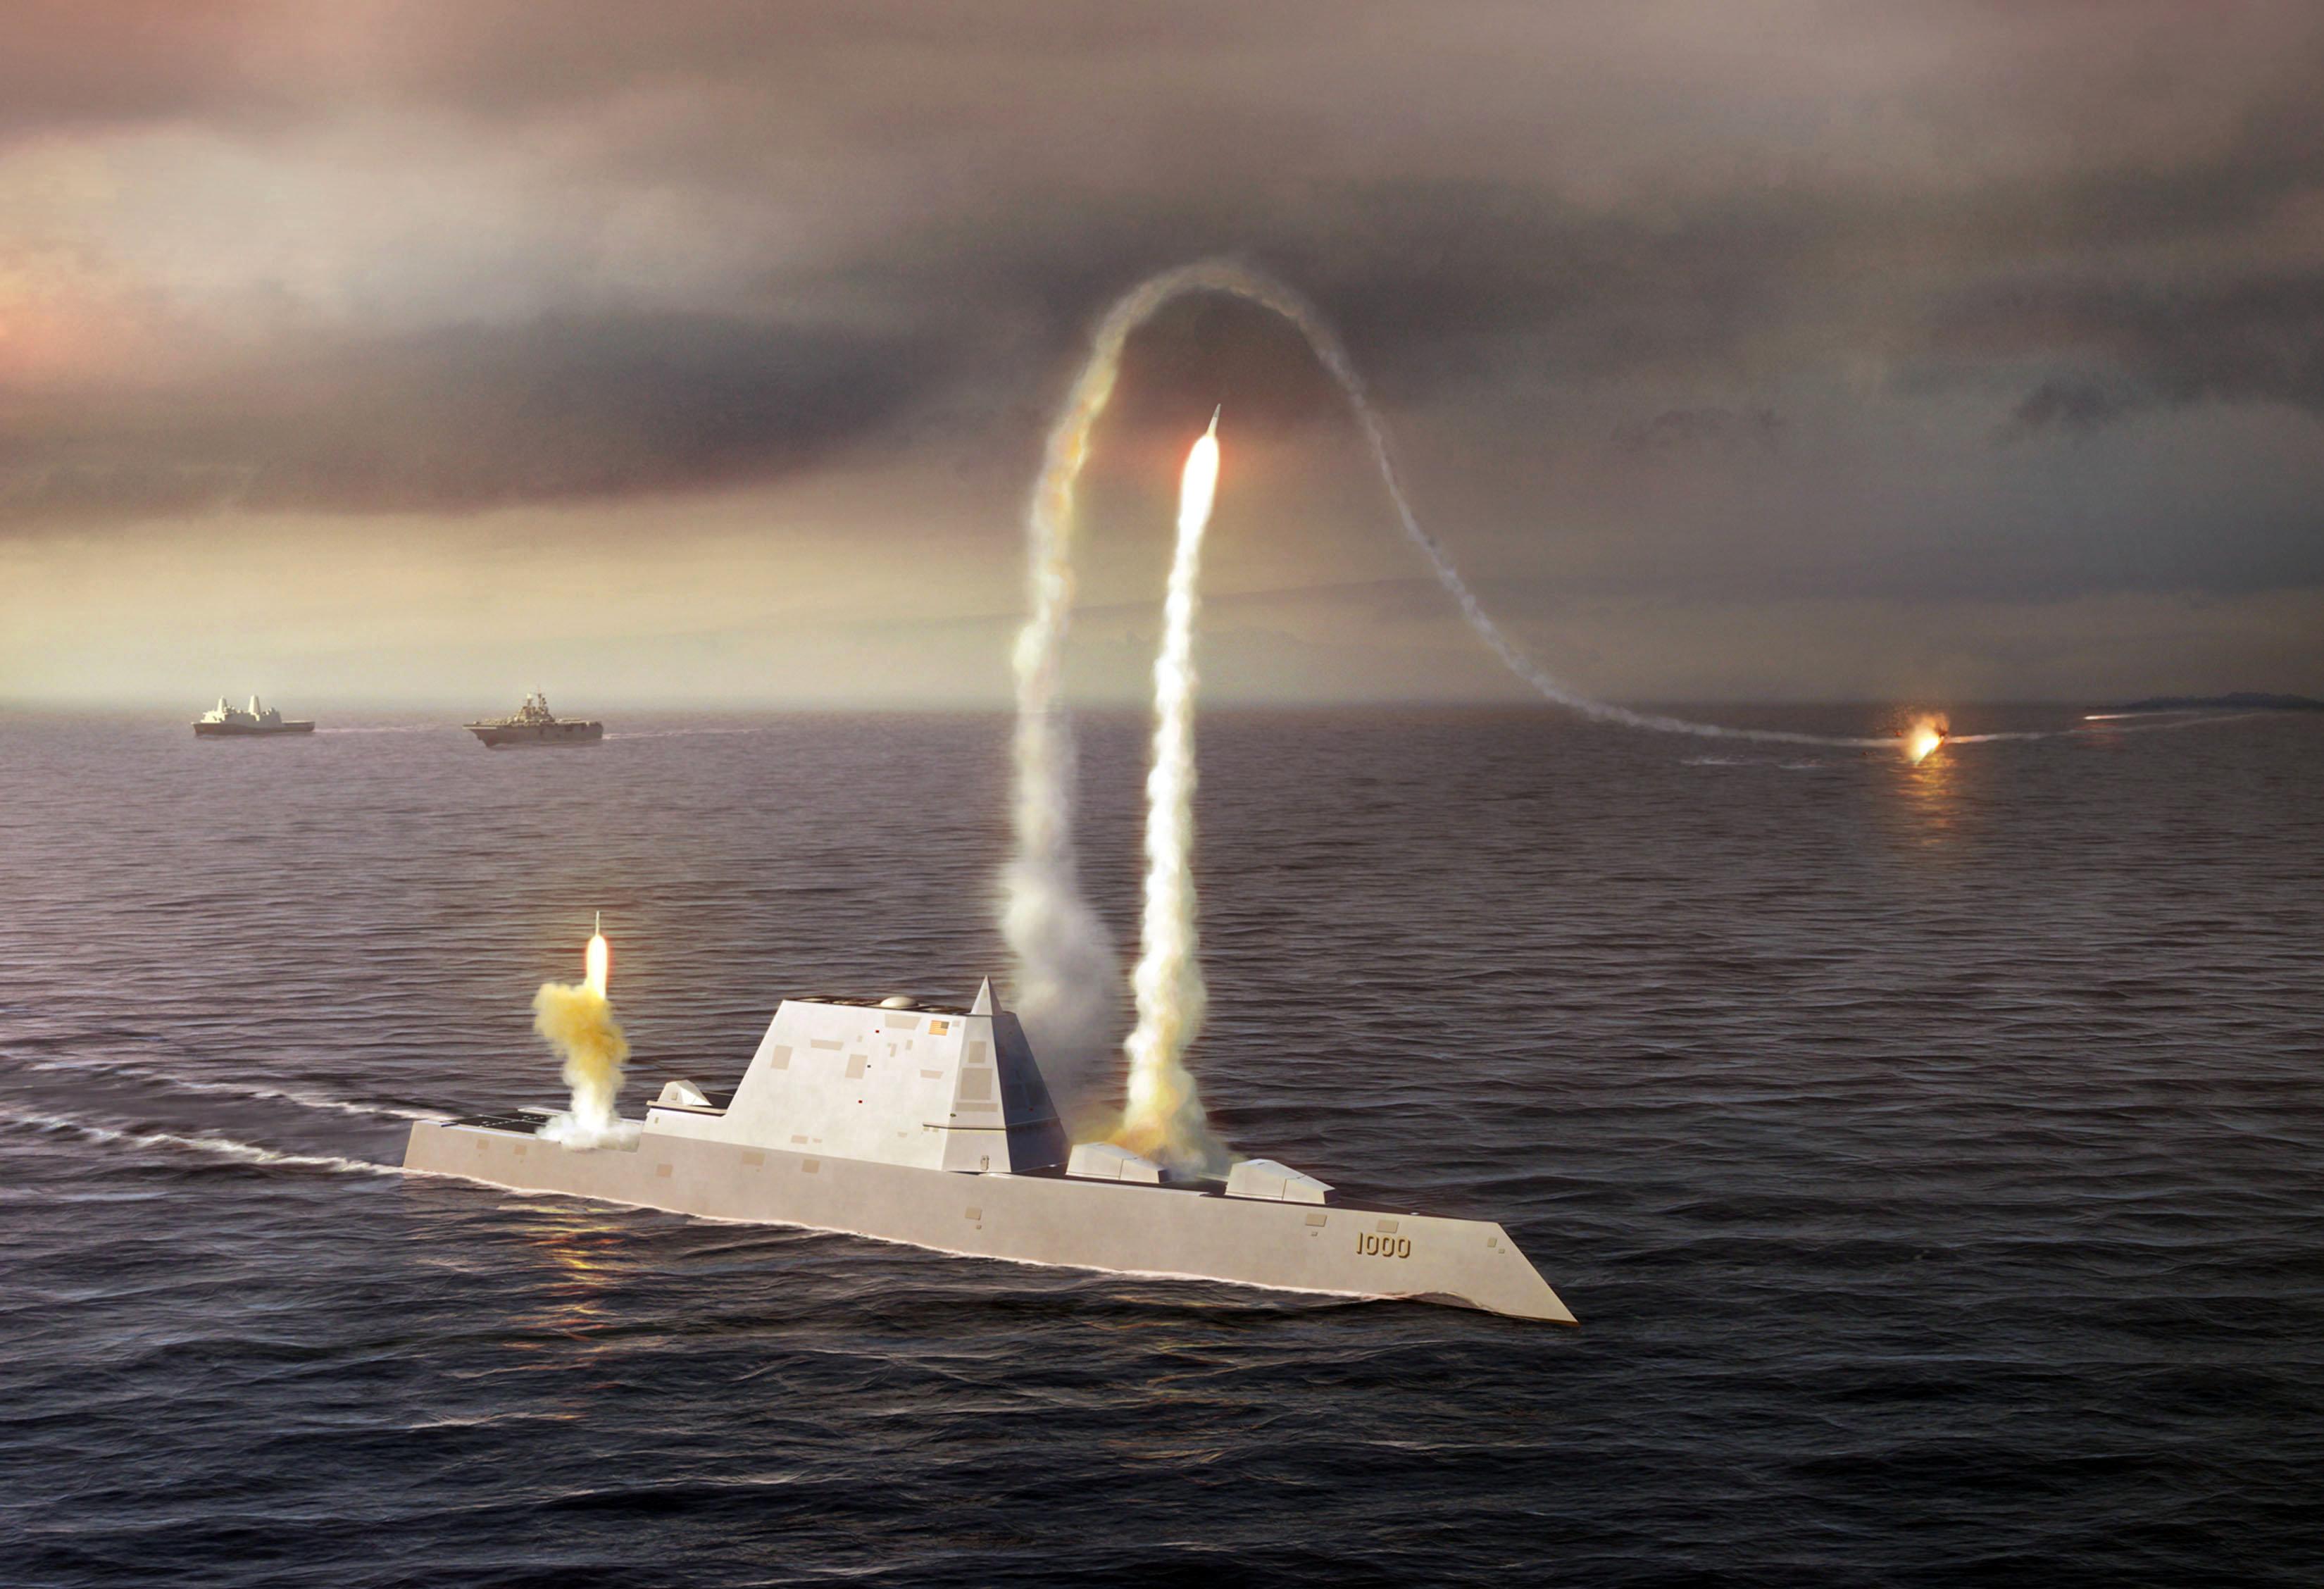 Artistic Rendering of the USS Zumwalt class destroyer DDG 1000